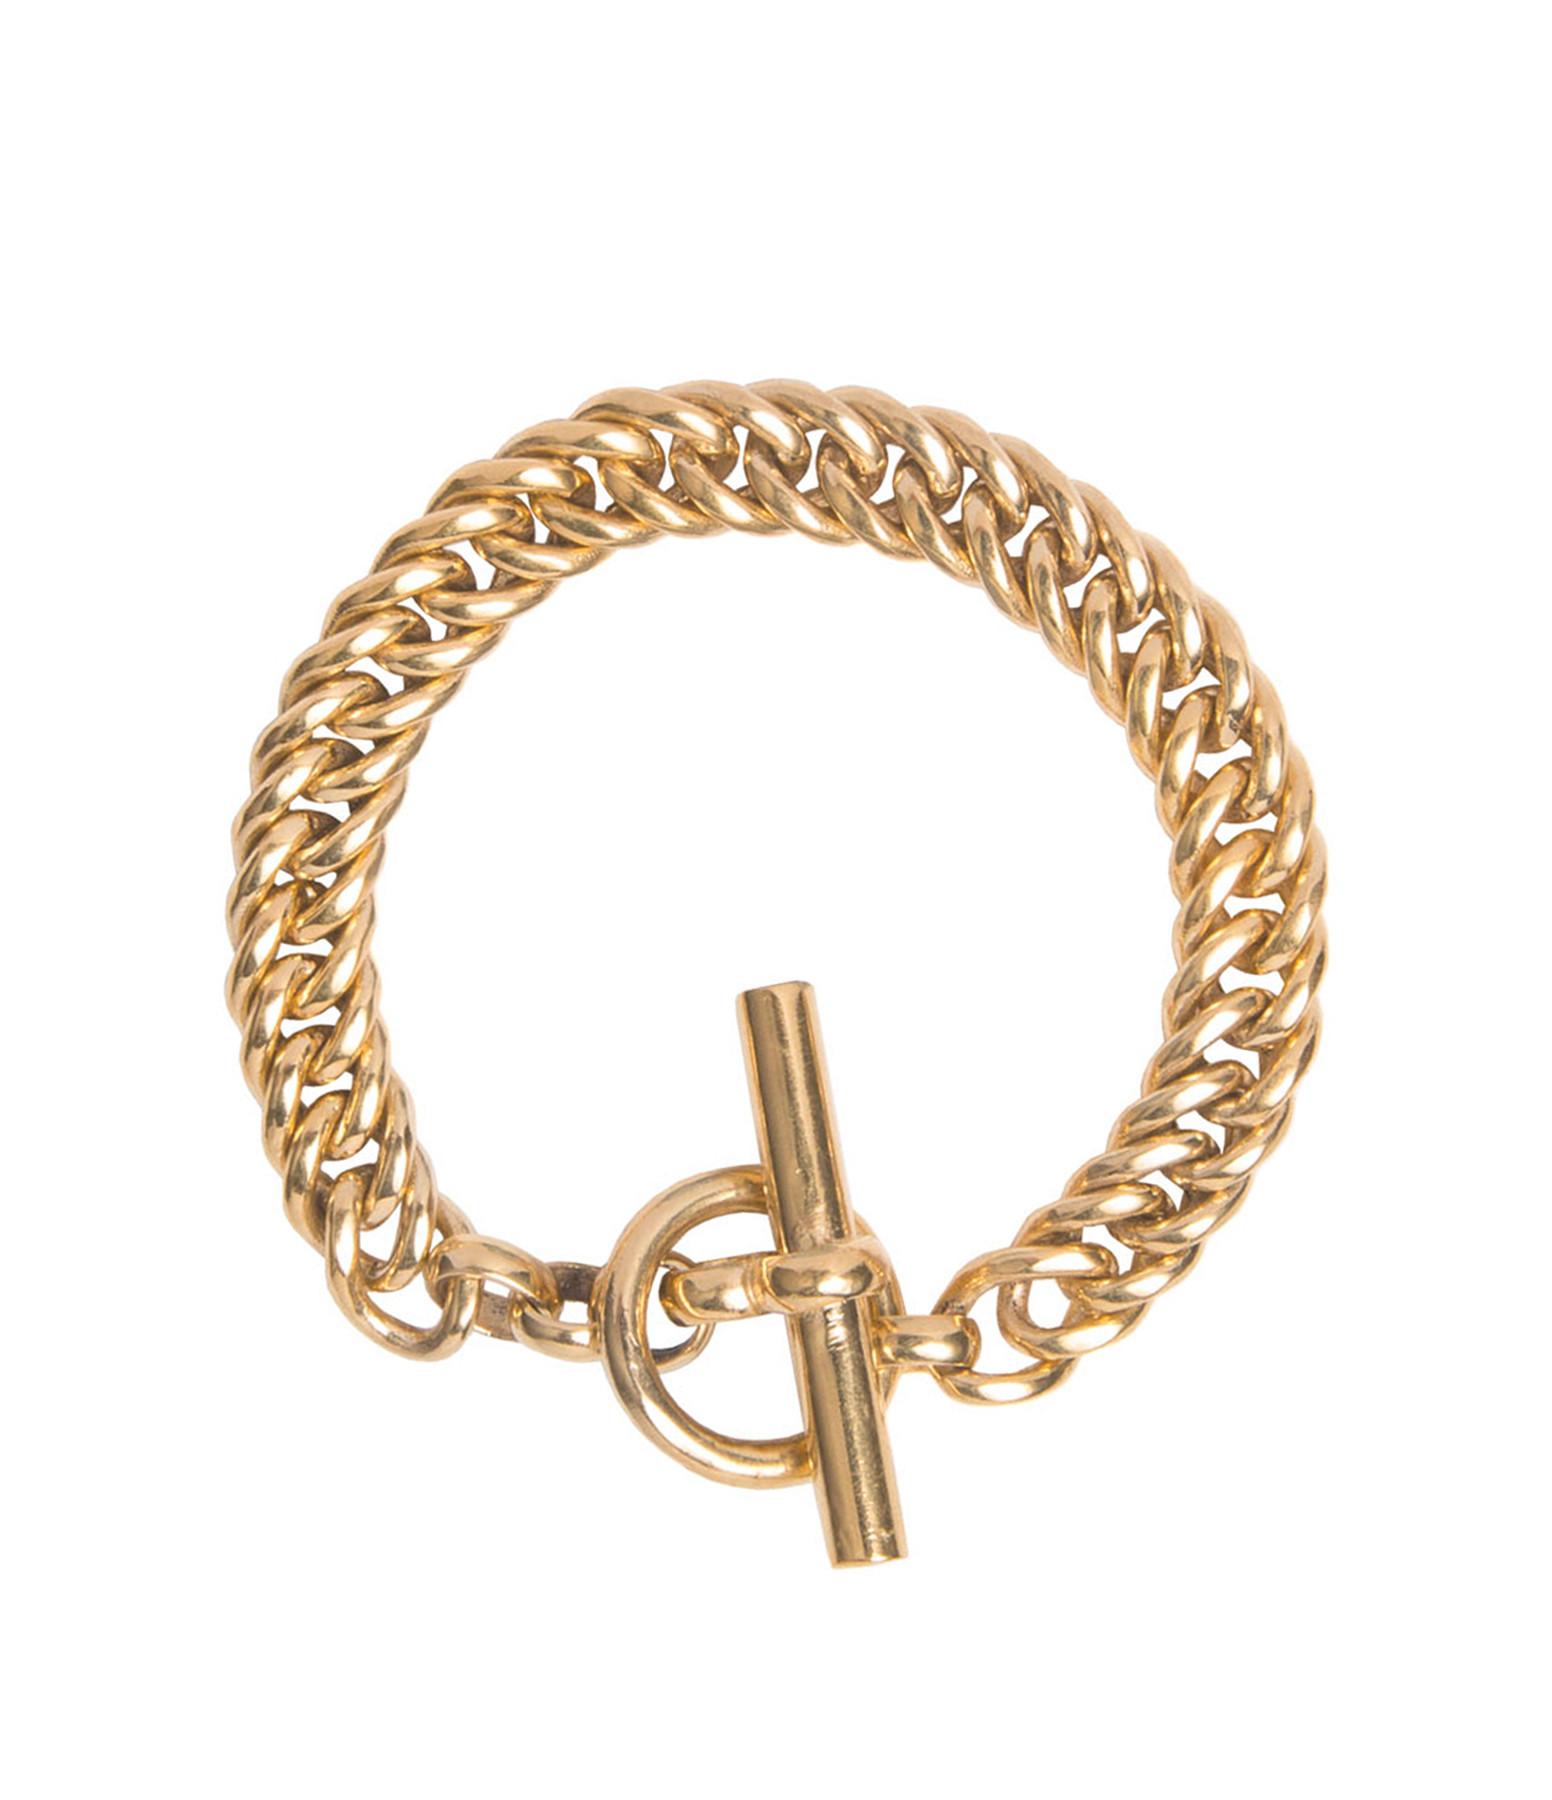 TILLY SVEAAS - Bracelet Curb Large Plaqué Or